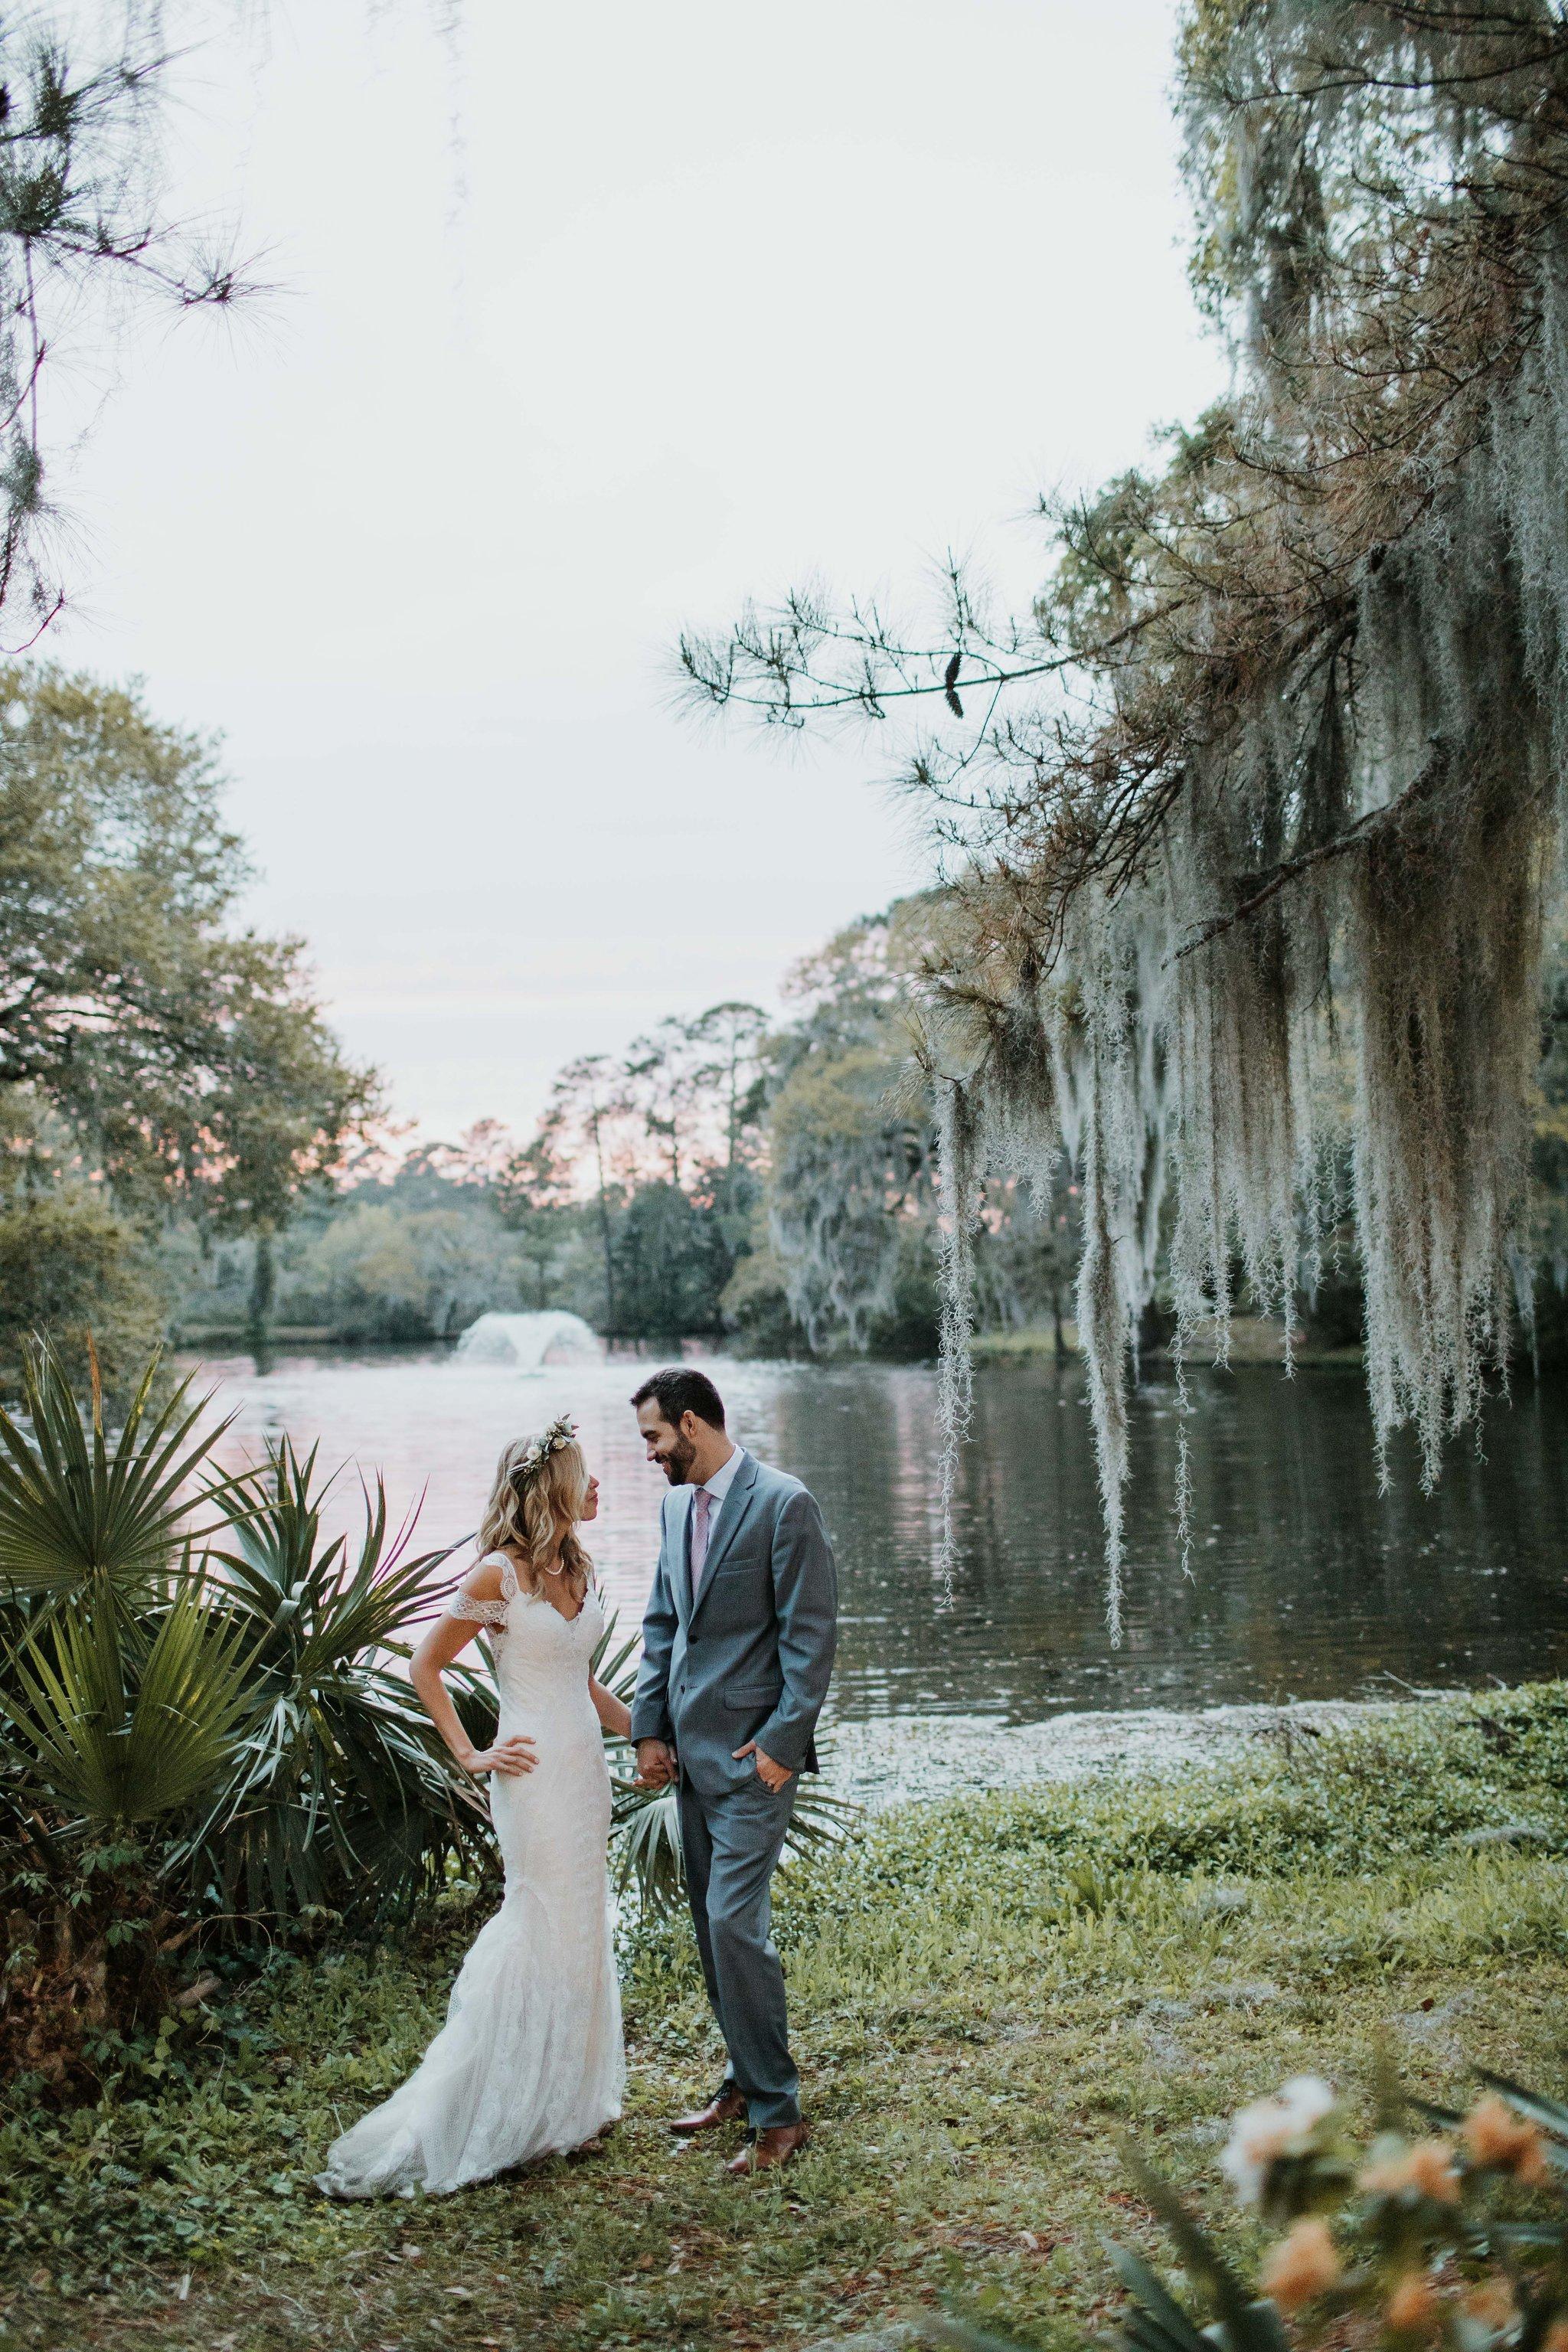 Legare-Waring-House-Charleston-SC-wedding-portrait-photography-375.jpg